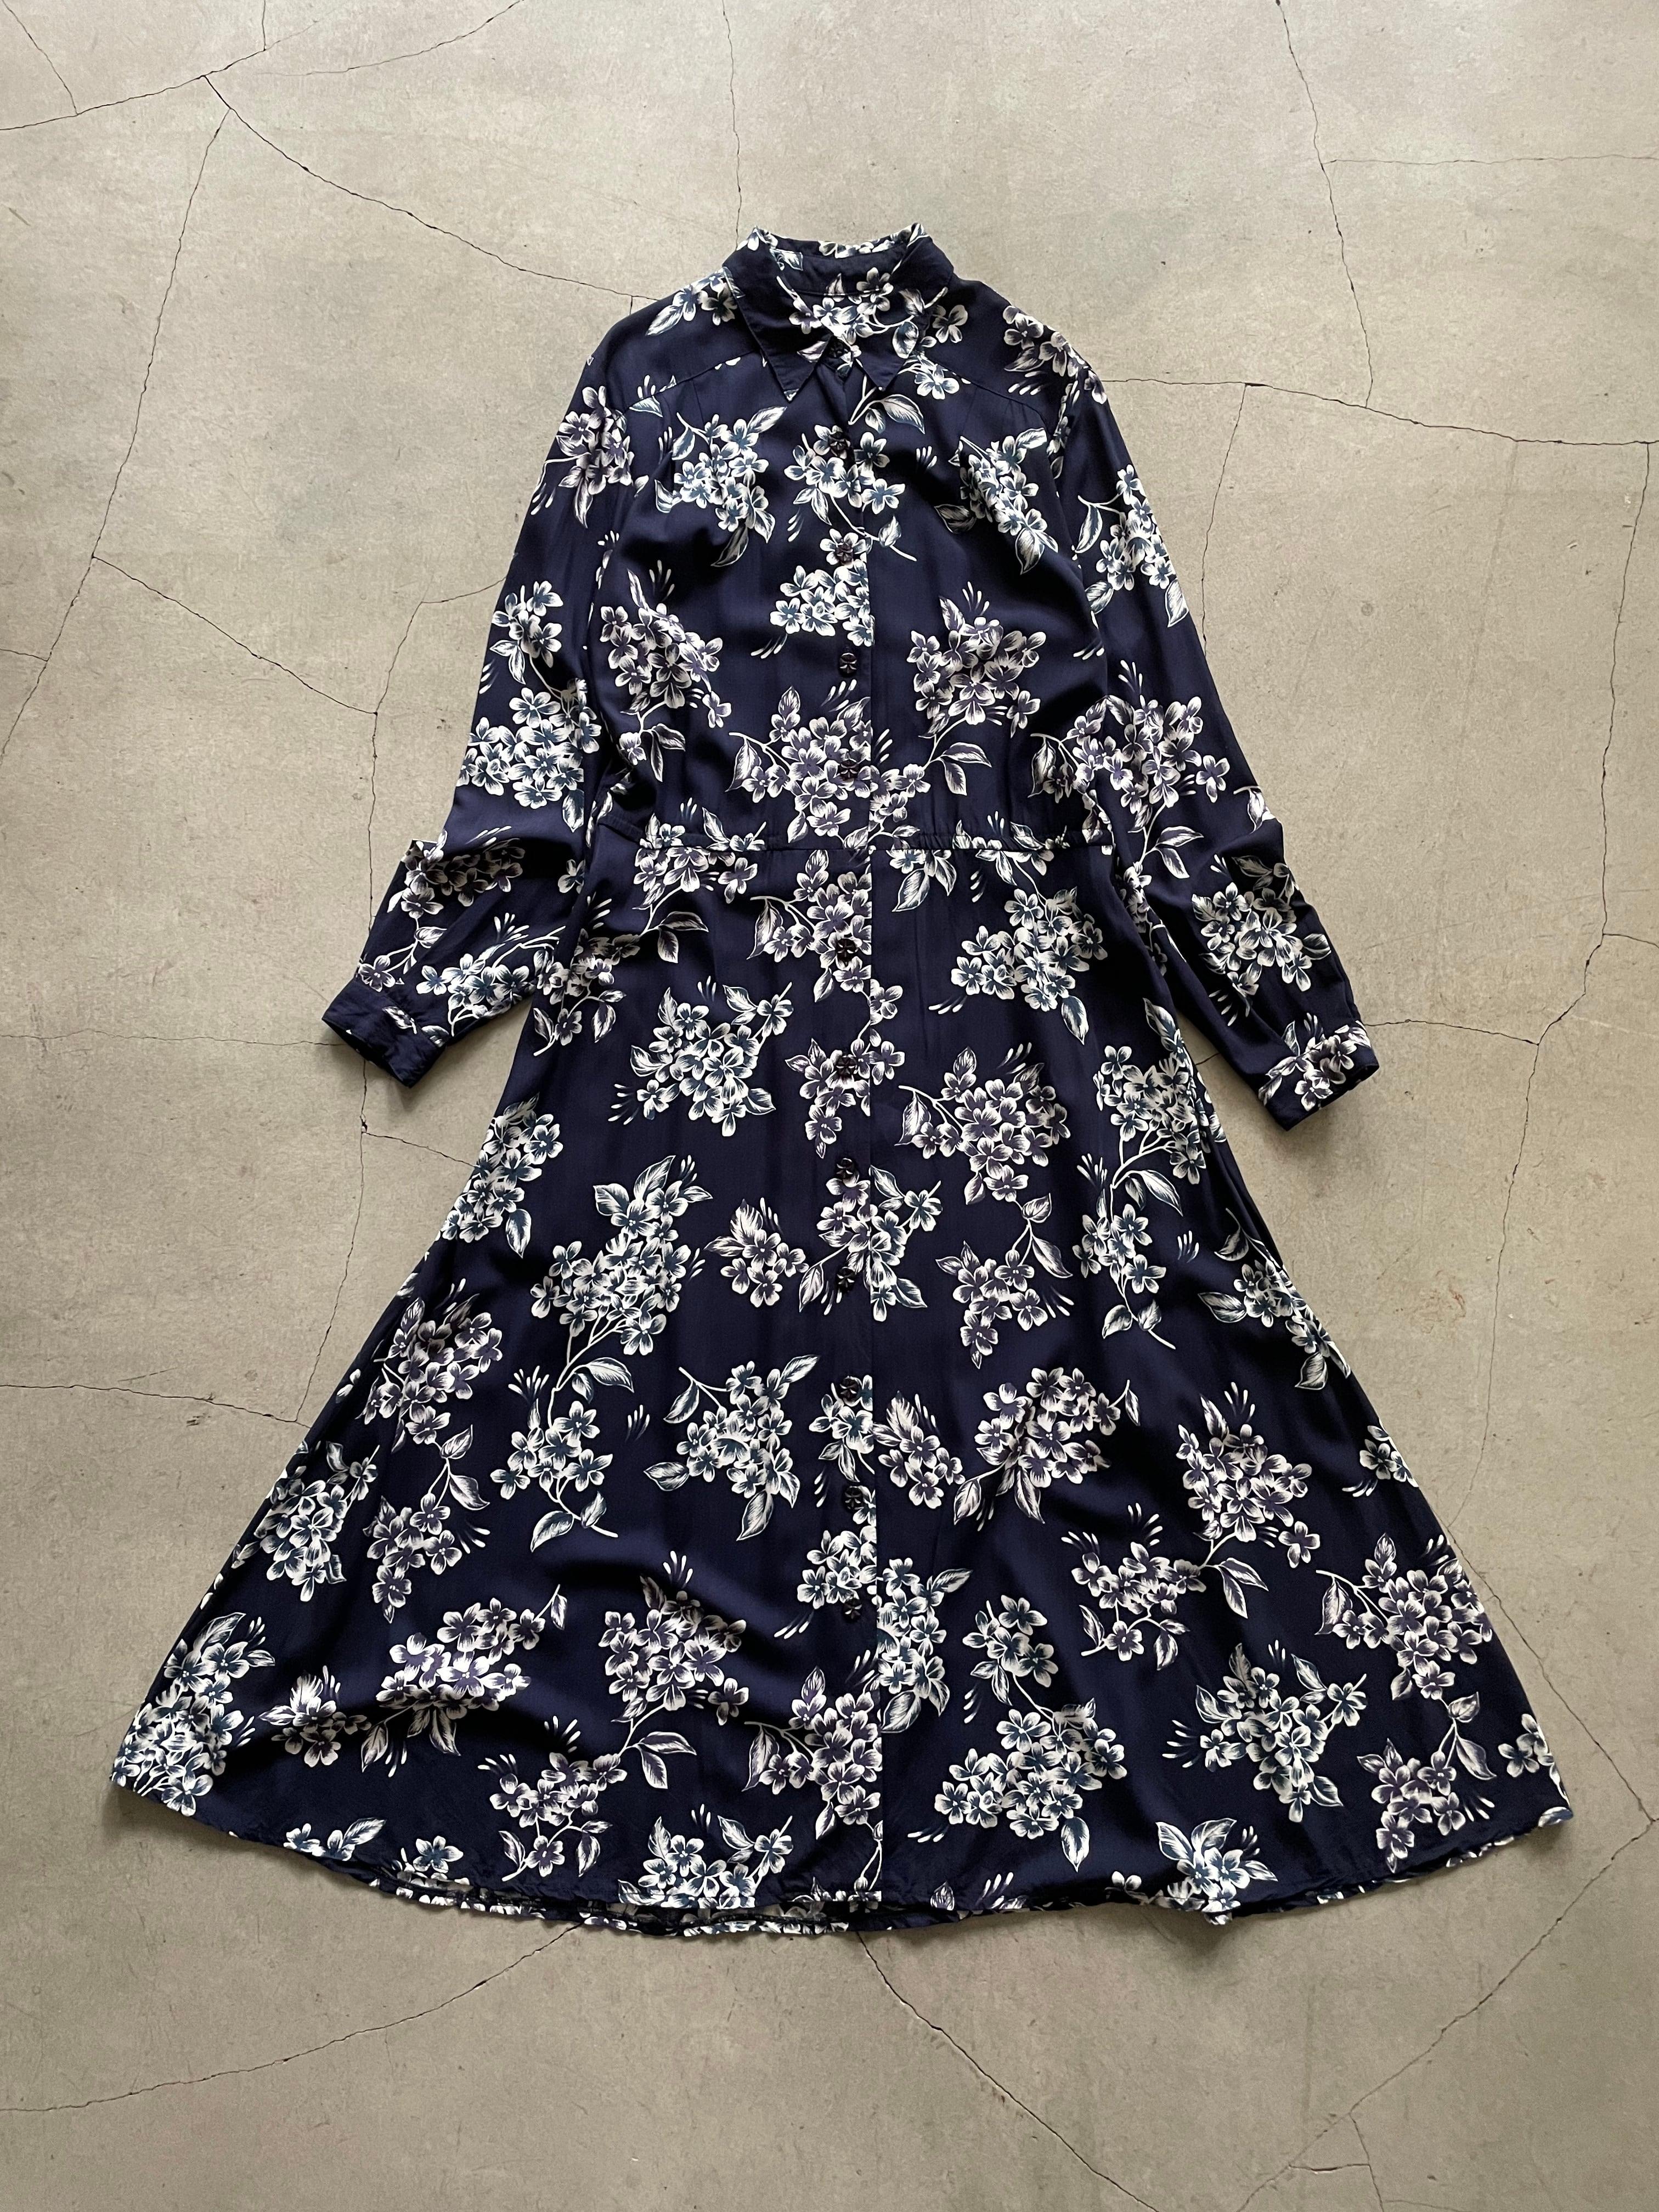 """Liz claiborne"" vintage floral onepiece"